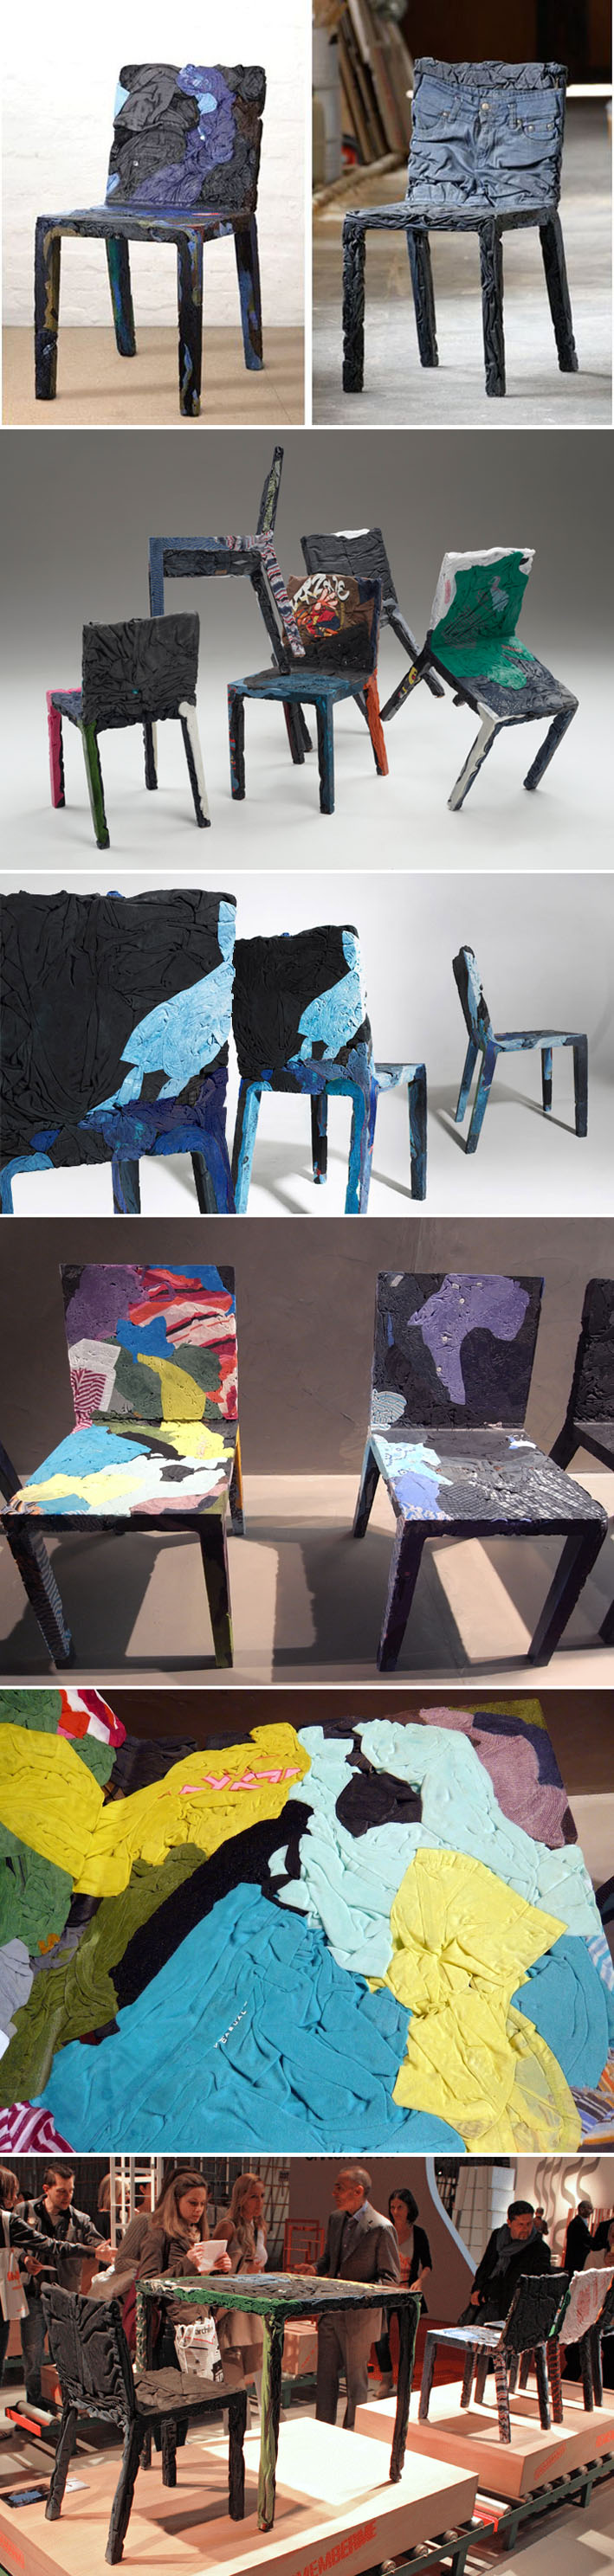 Designers criam móveis sustentáveis reciclando roupas e papeis velhos stylo urbano-1